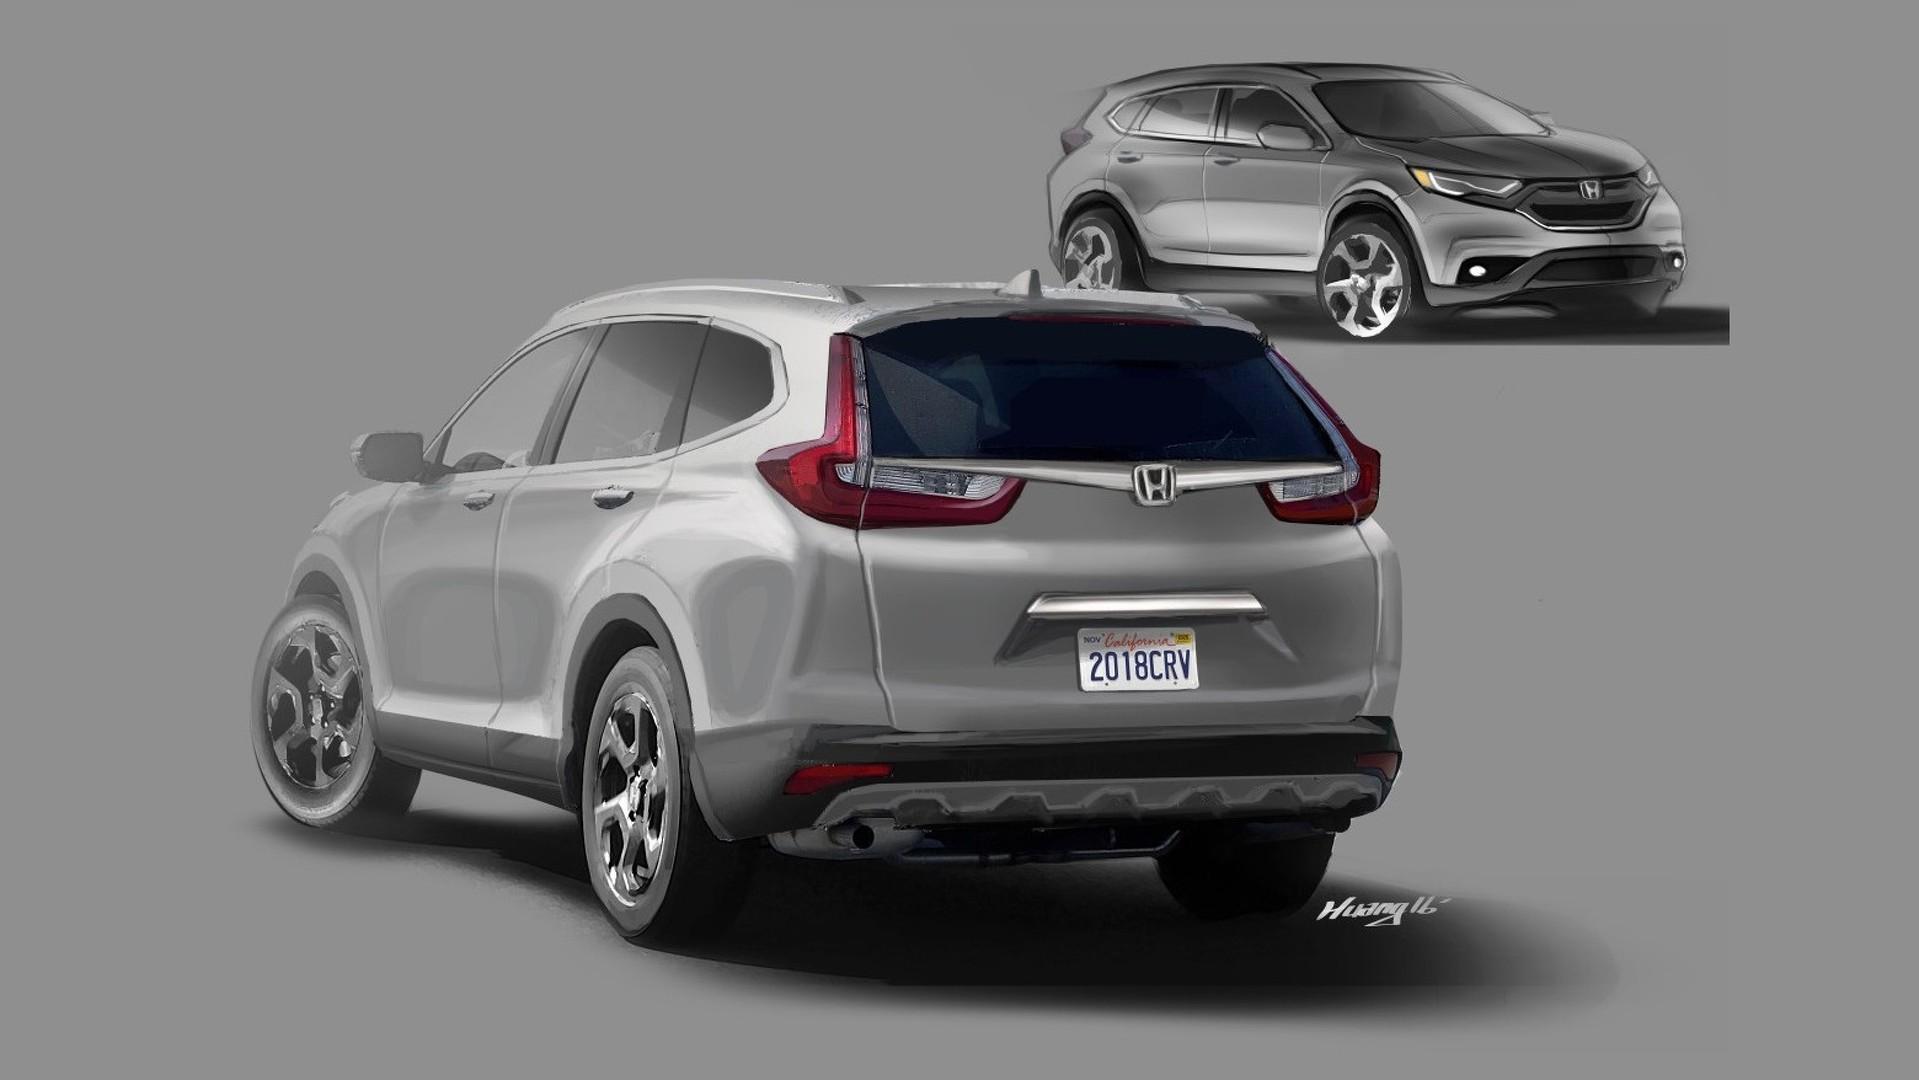 Reader Envisions 2018 Honda Cr V Based On Spy Shots